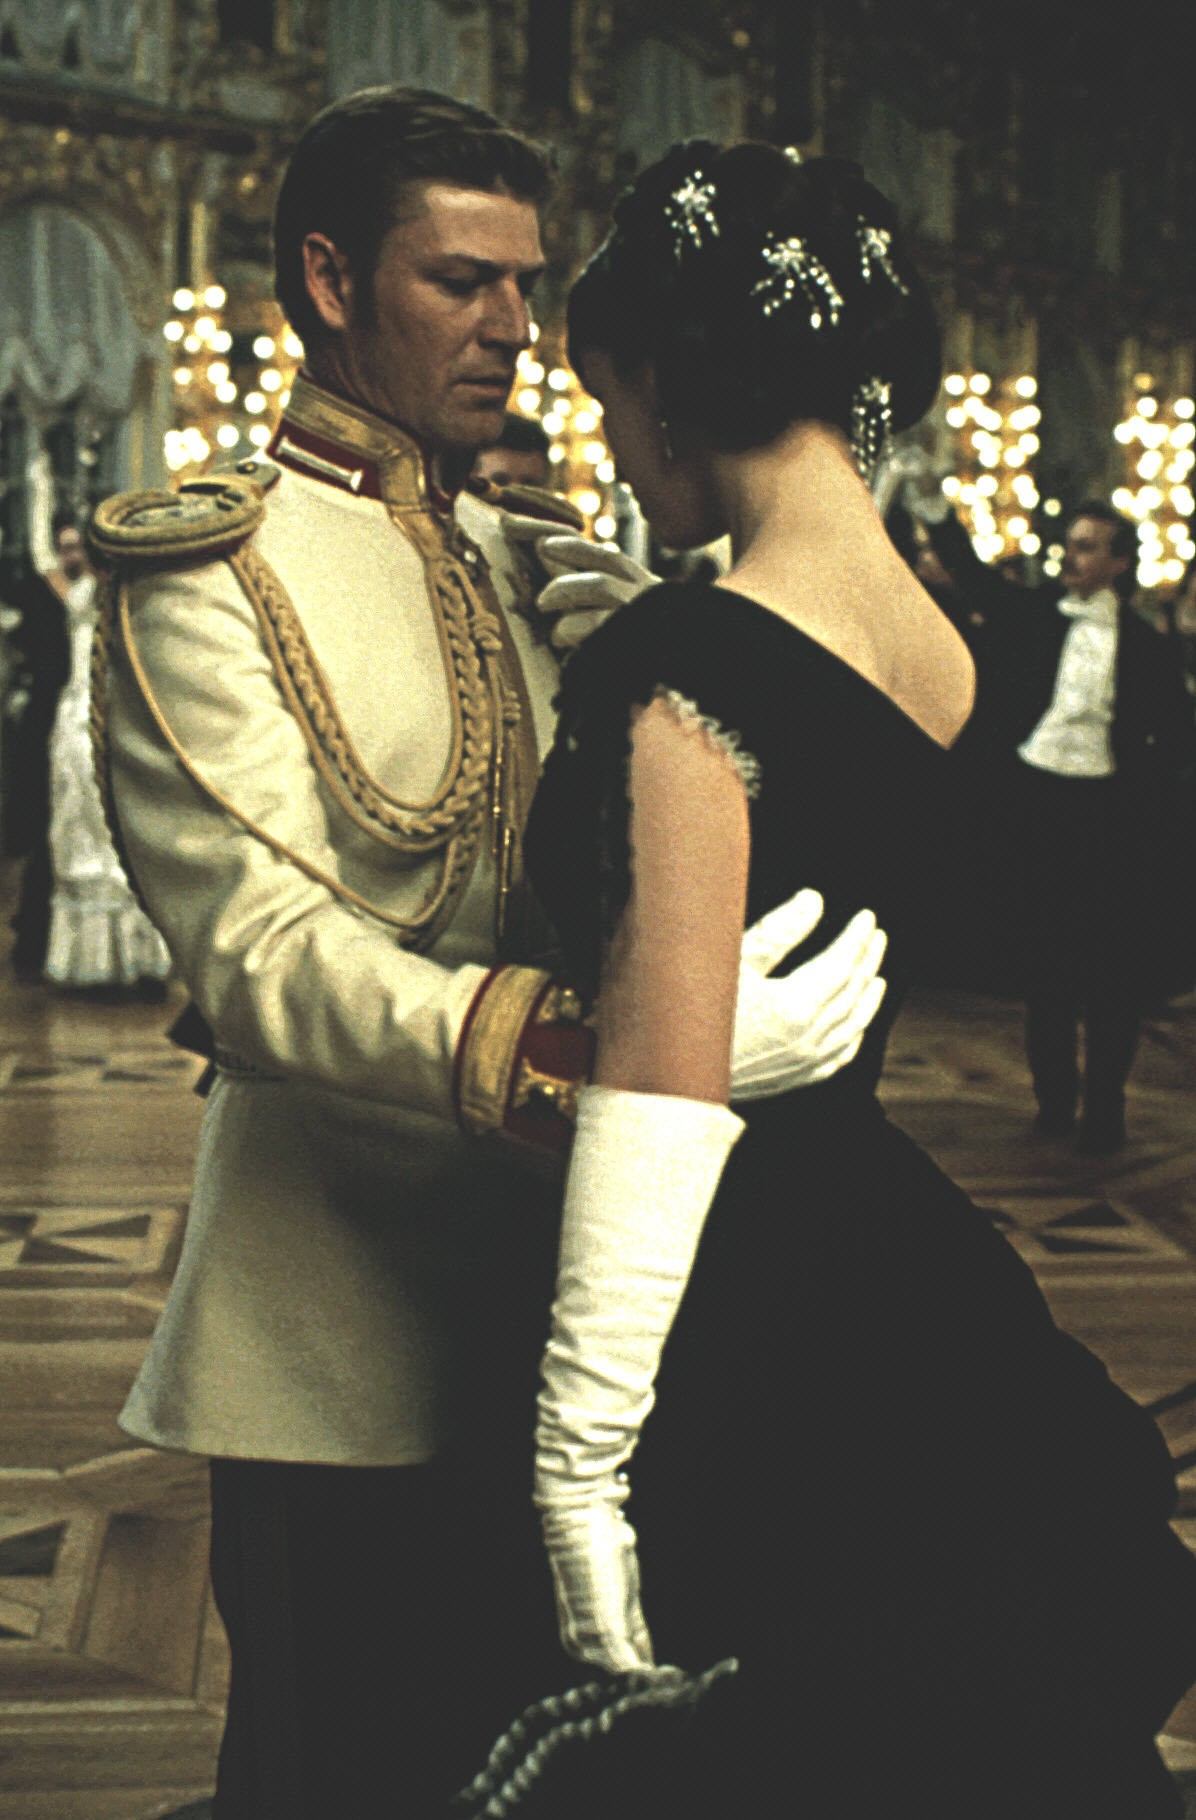 Tolstoy S Love Affair With Film 171 Jmledwellwrites